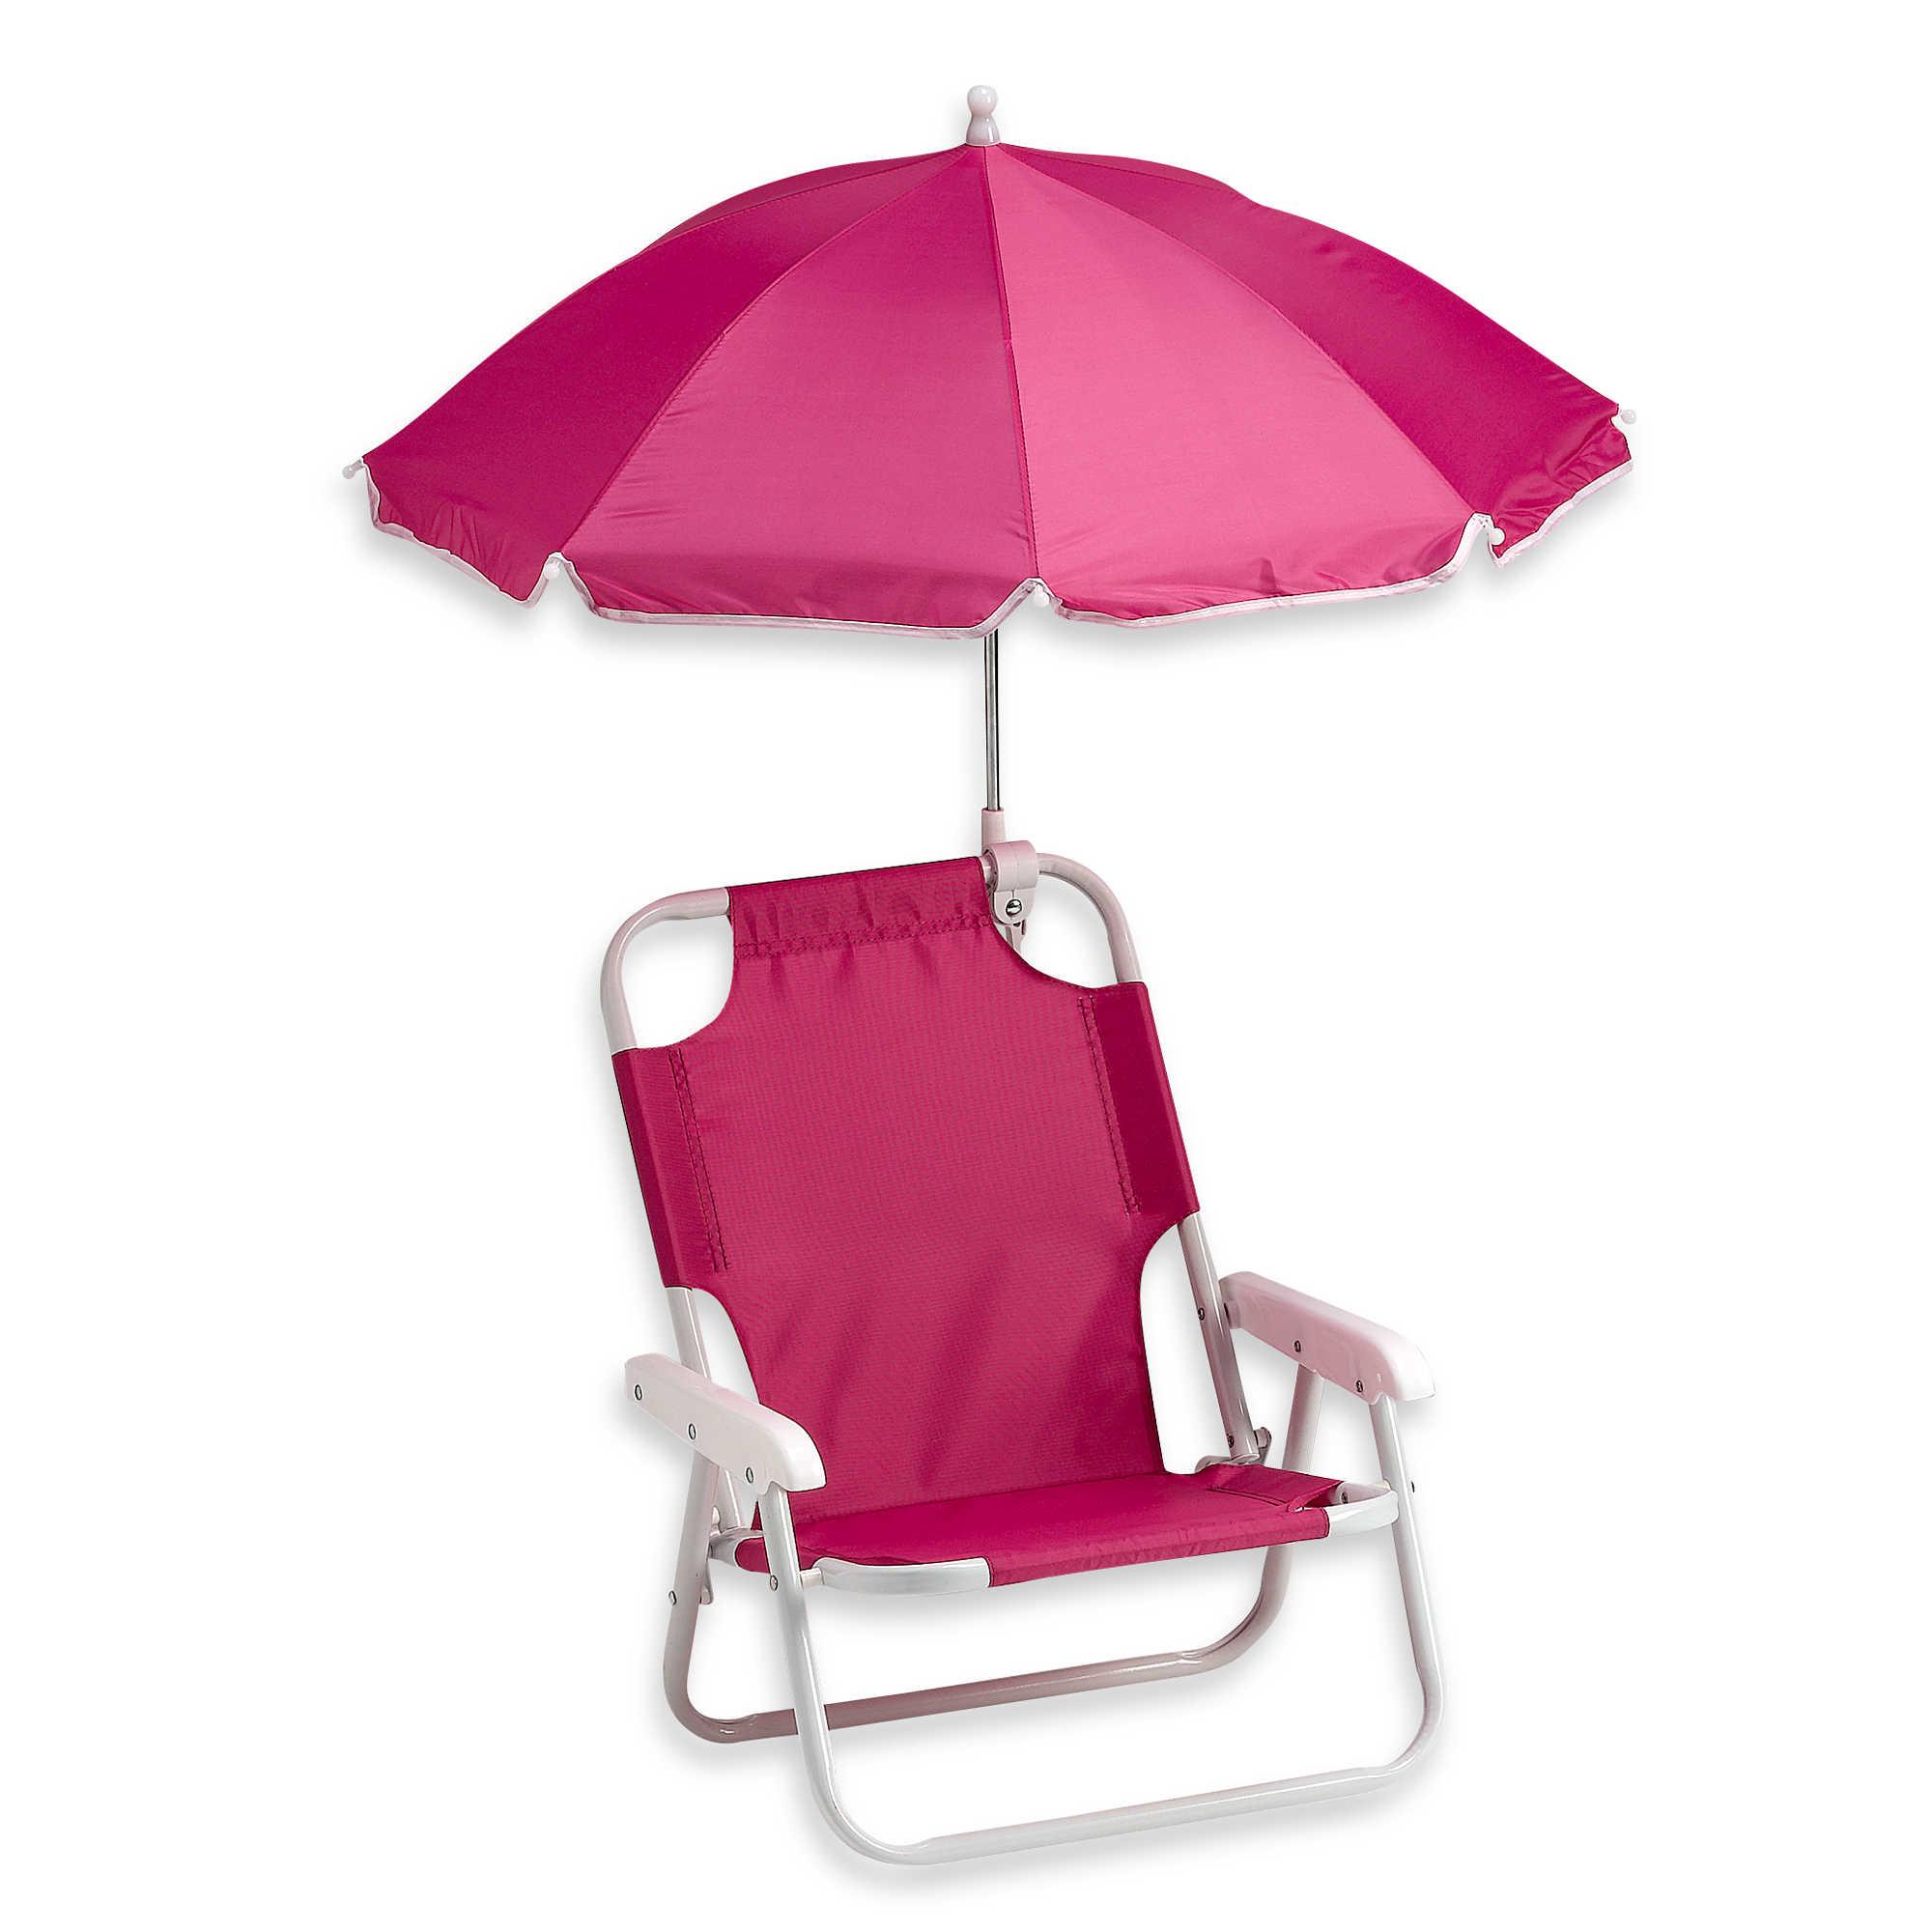 Folding Beach Chair with Umbrella  Purple Pumpkin Gifts